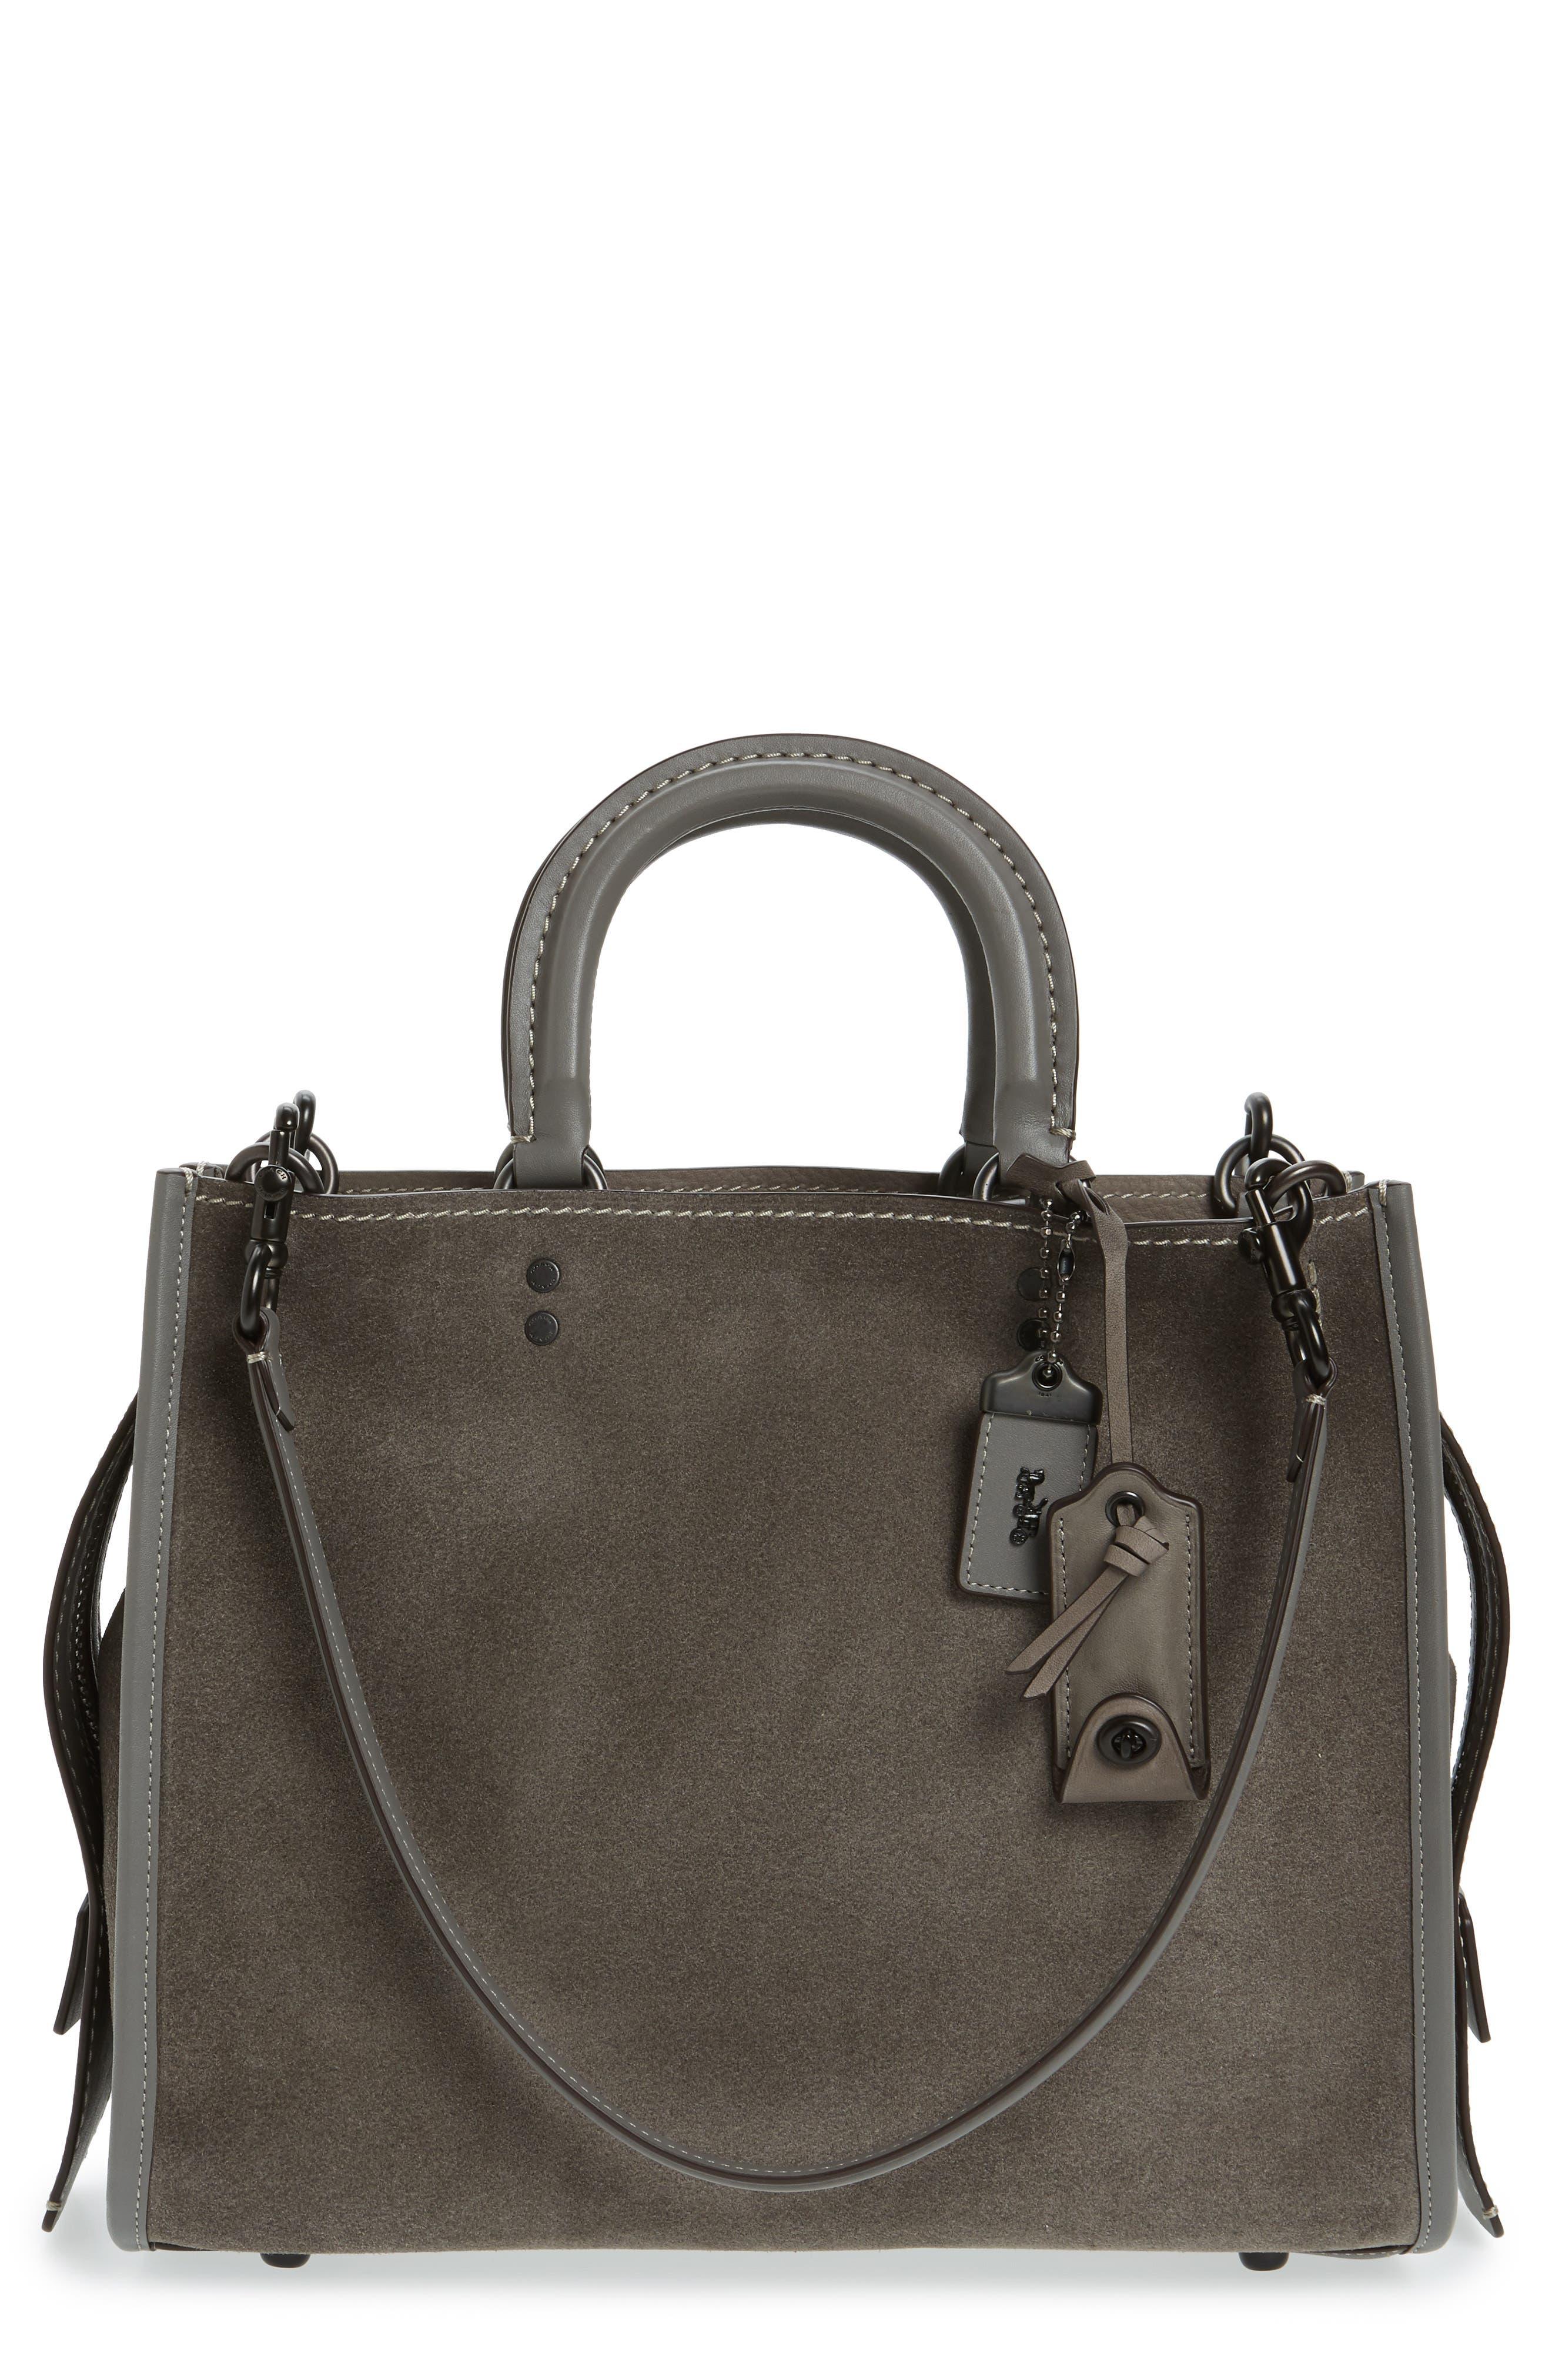 Main Image - COACH 1941 'Rogue' Leather Satchel